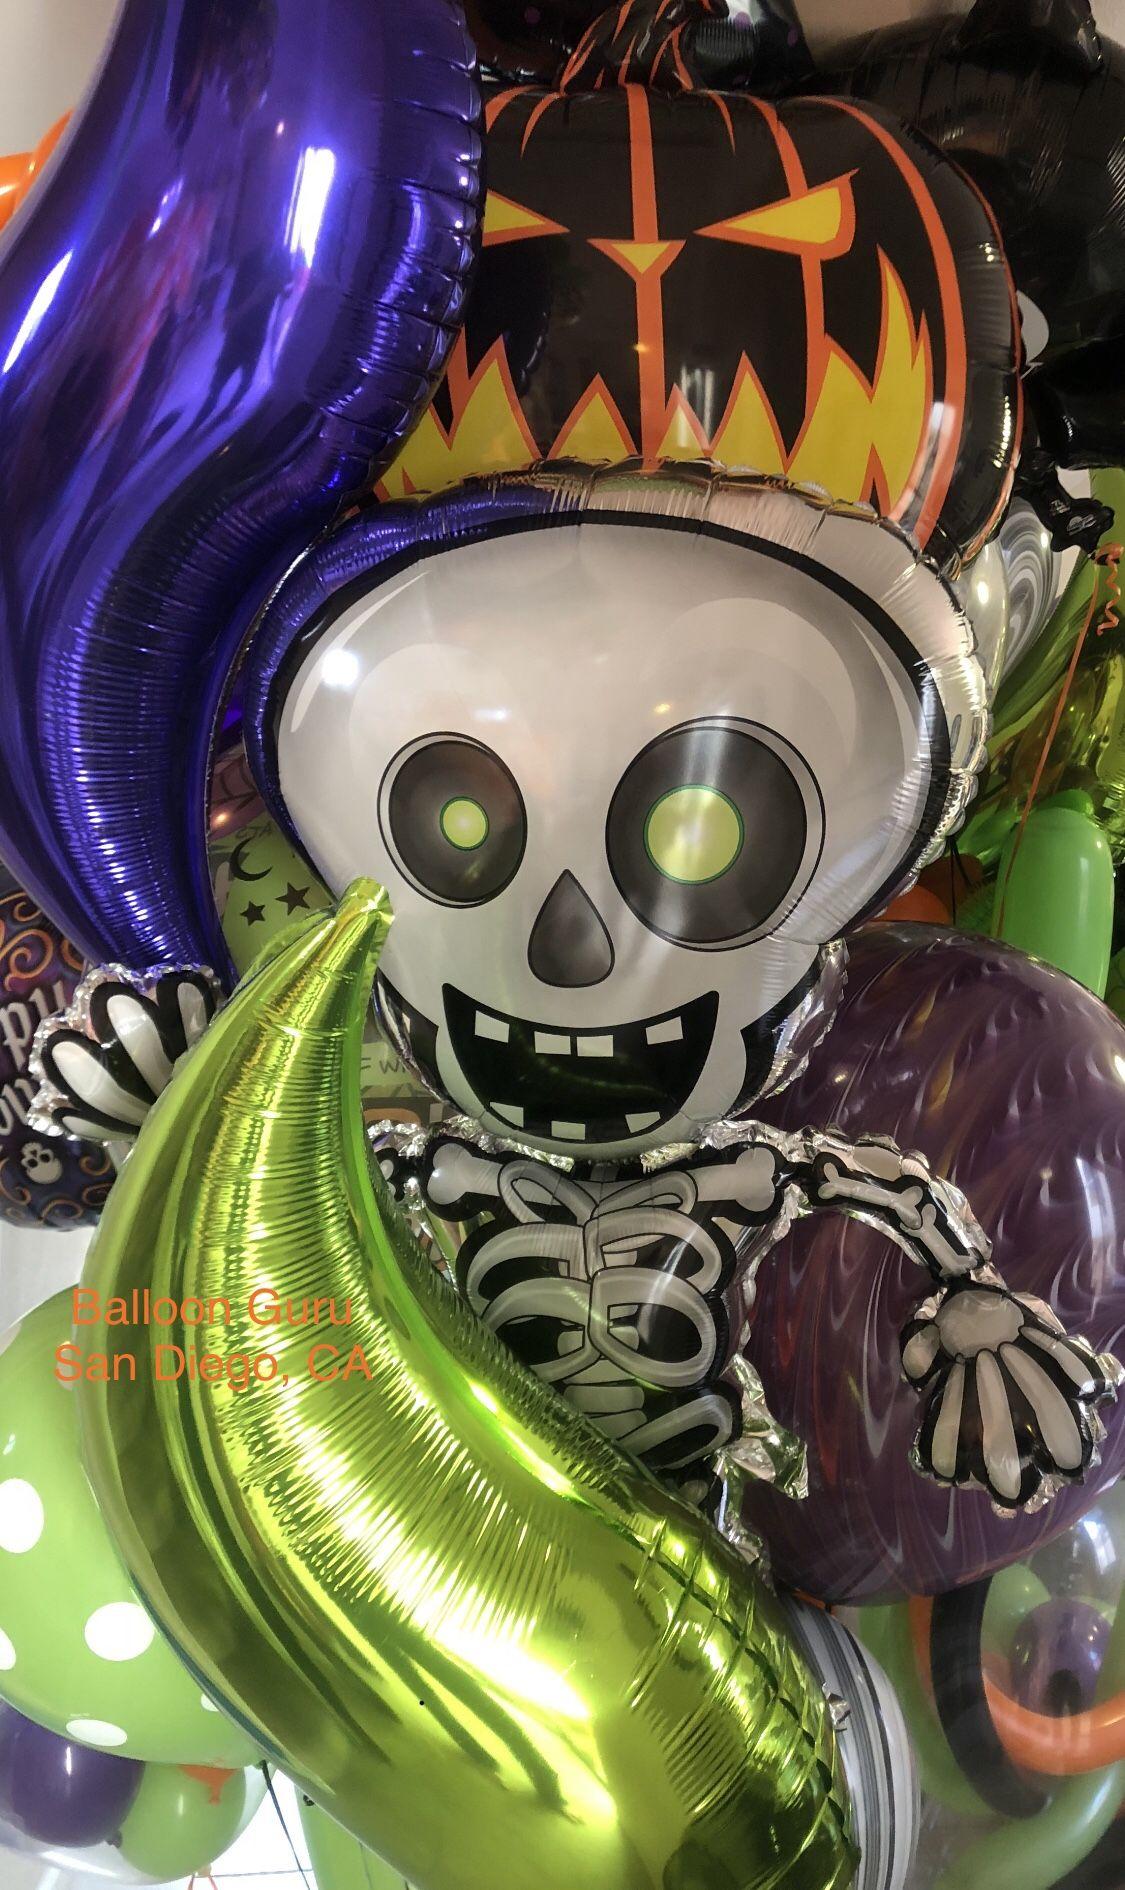 Balloons image by Frankaggot in 2020 Days till halloween